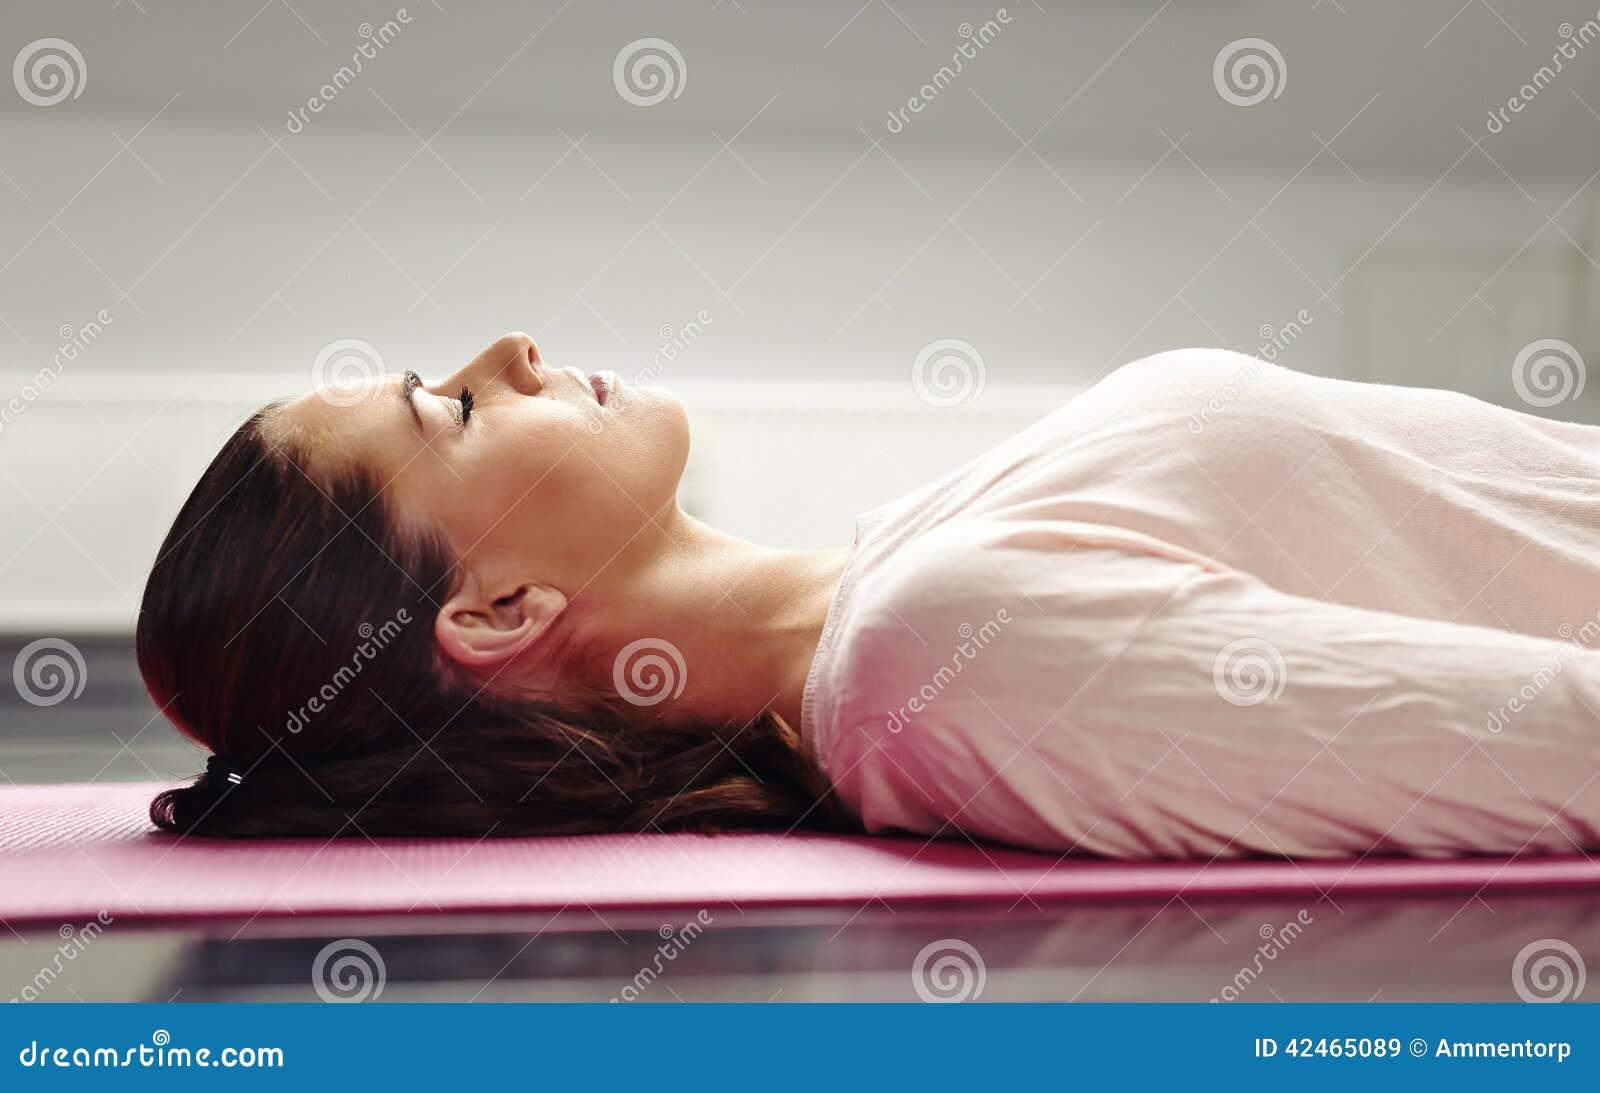 Woman lying on yoga mat relaxing her muscles